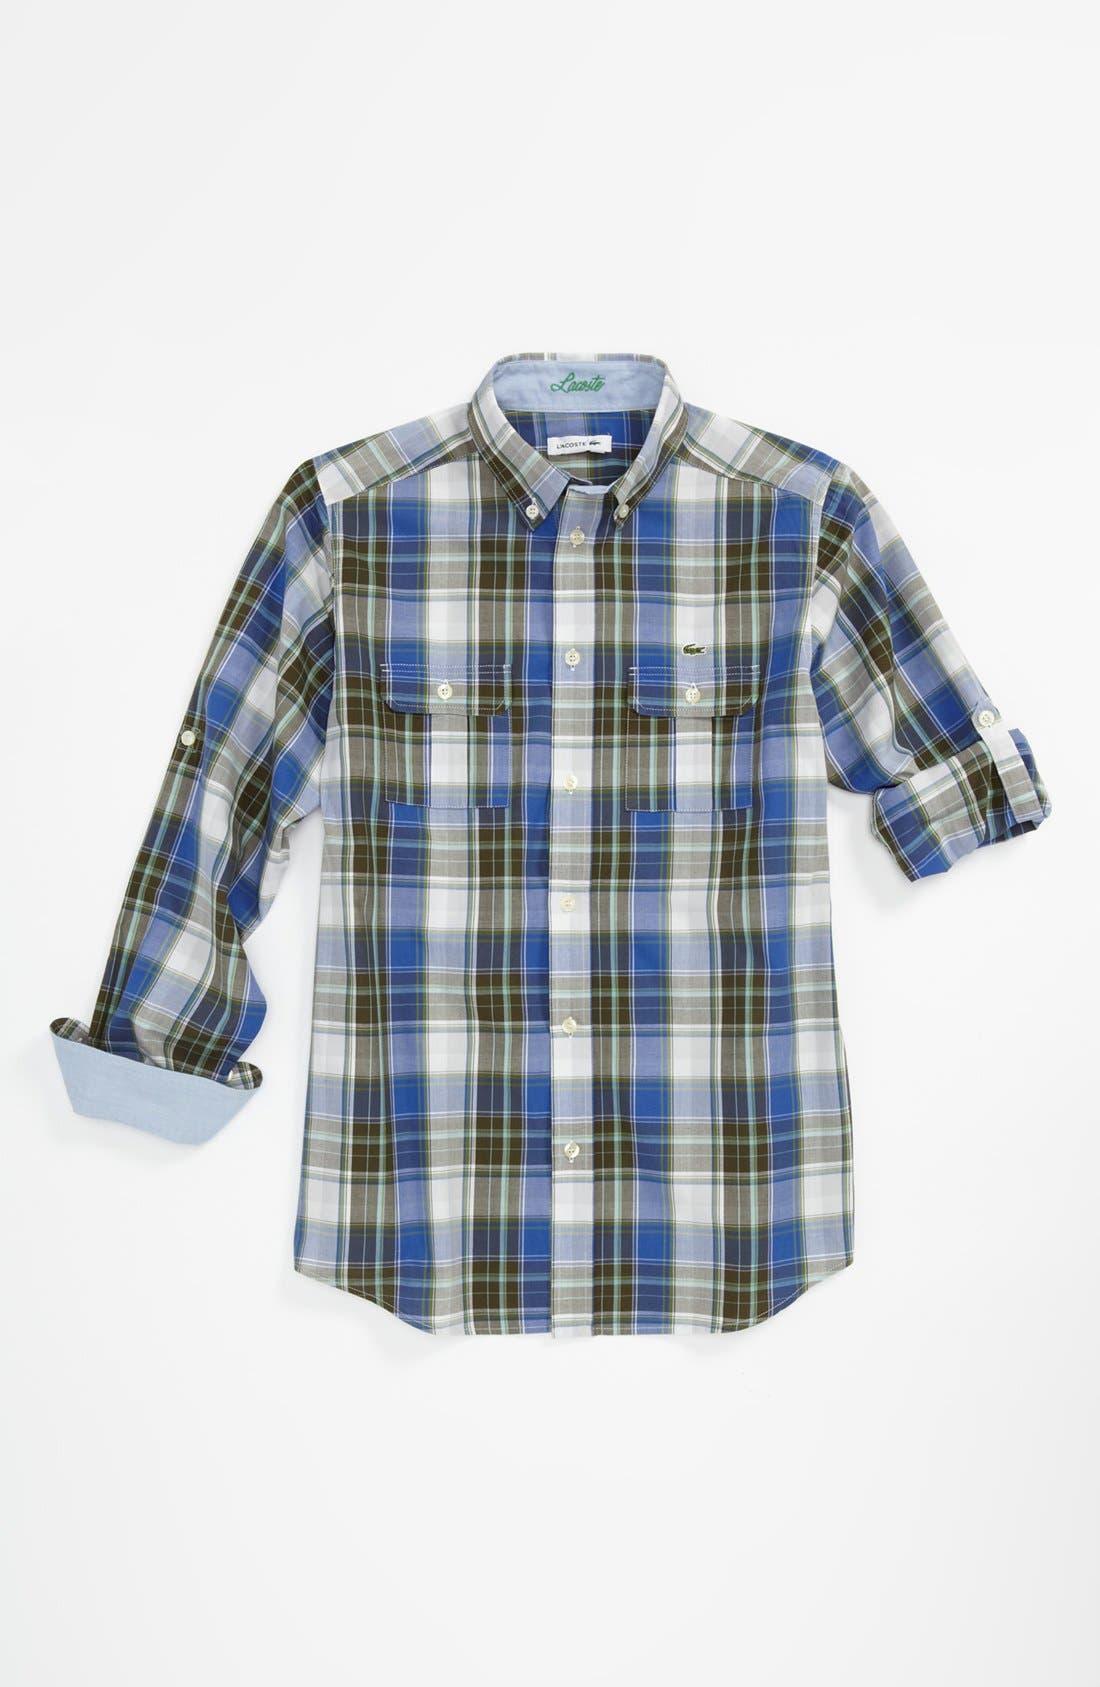 Main Image - Lacoste Plaid Woven Shirt (Little Boys & Big Boys)